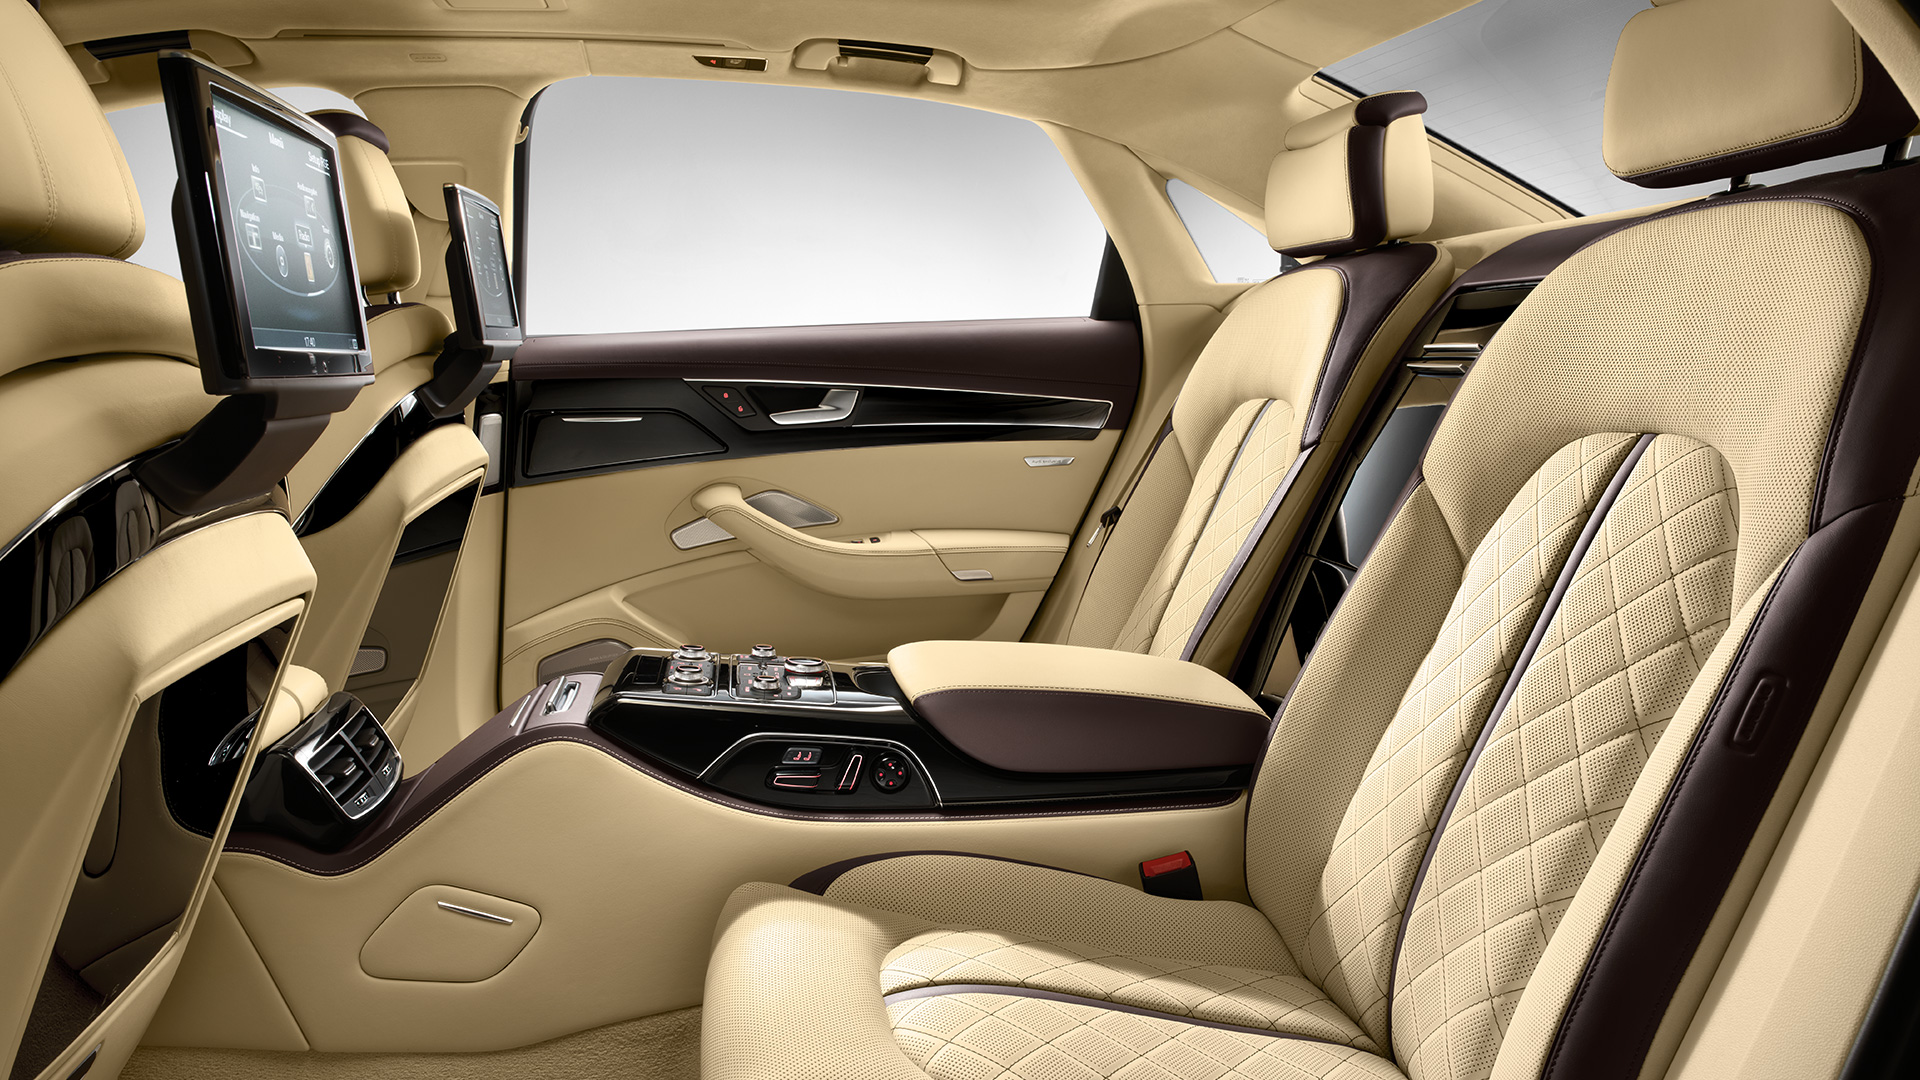 AUDI A8 L specs - 2013, 2014, 2015, 2016, 2017 - autoevolution